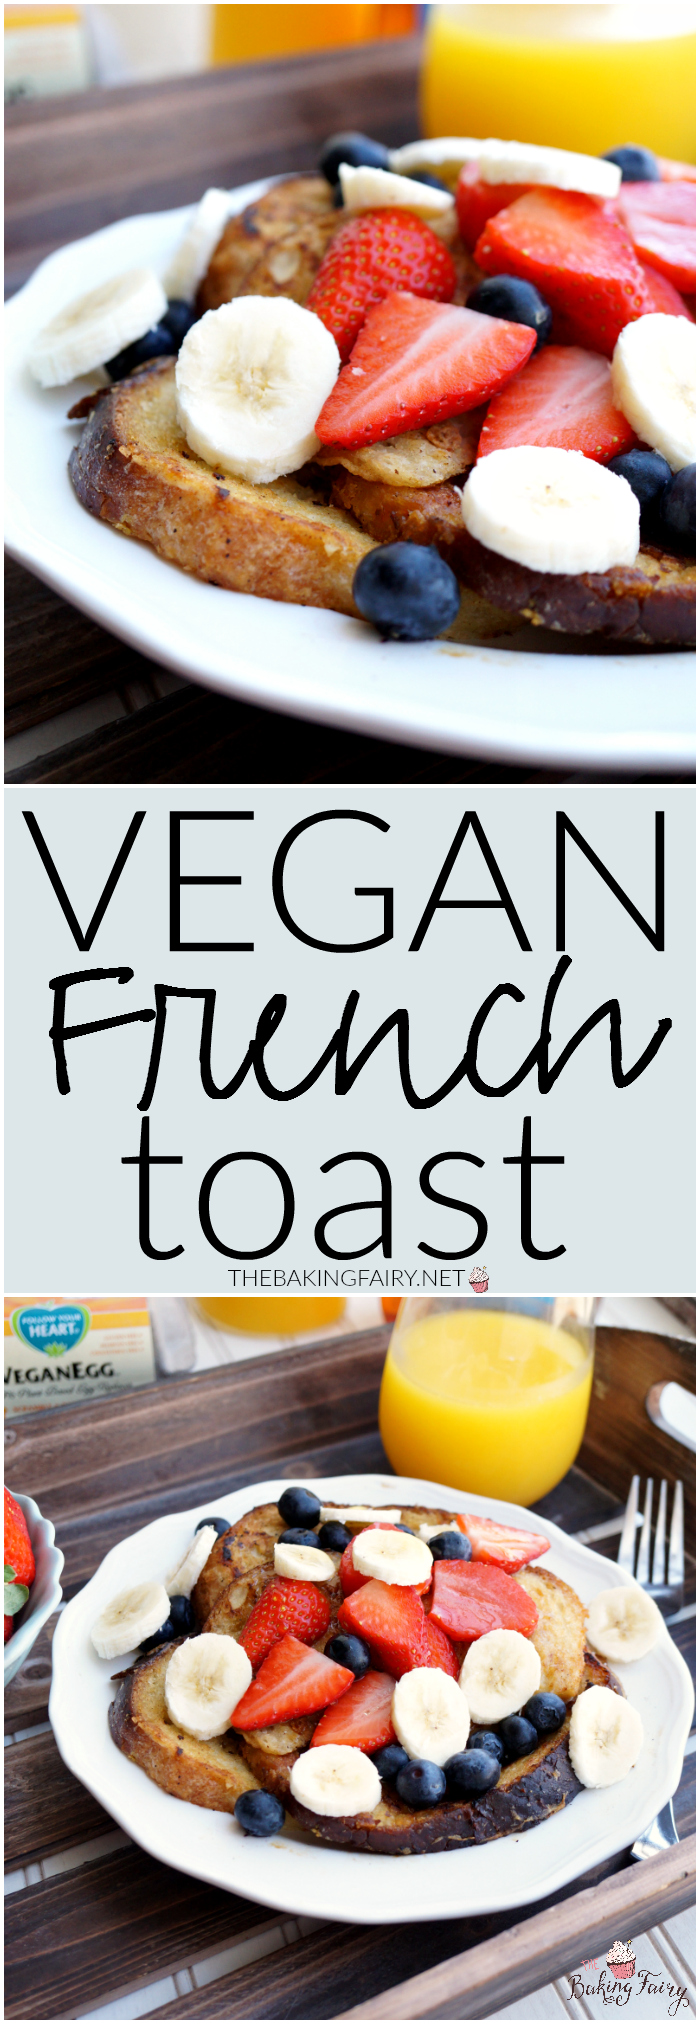 vegan french toast   The Baking Fairy